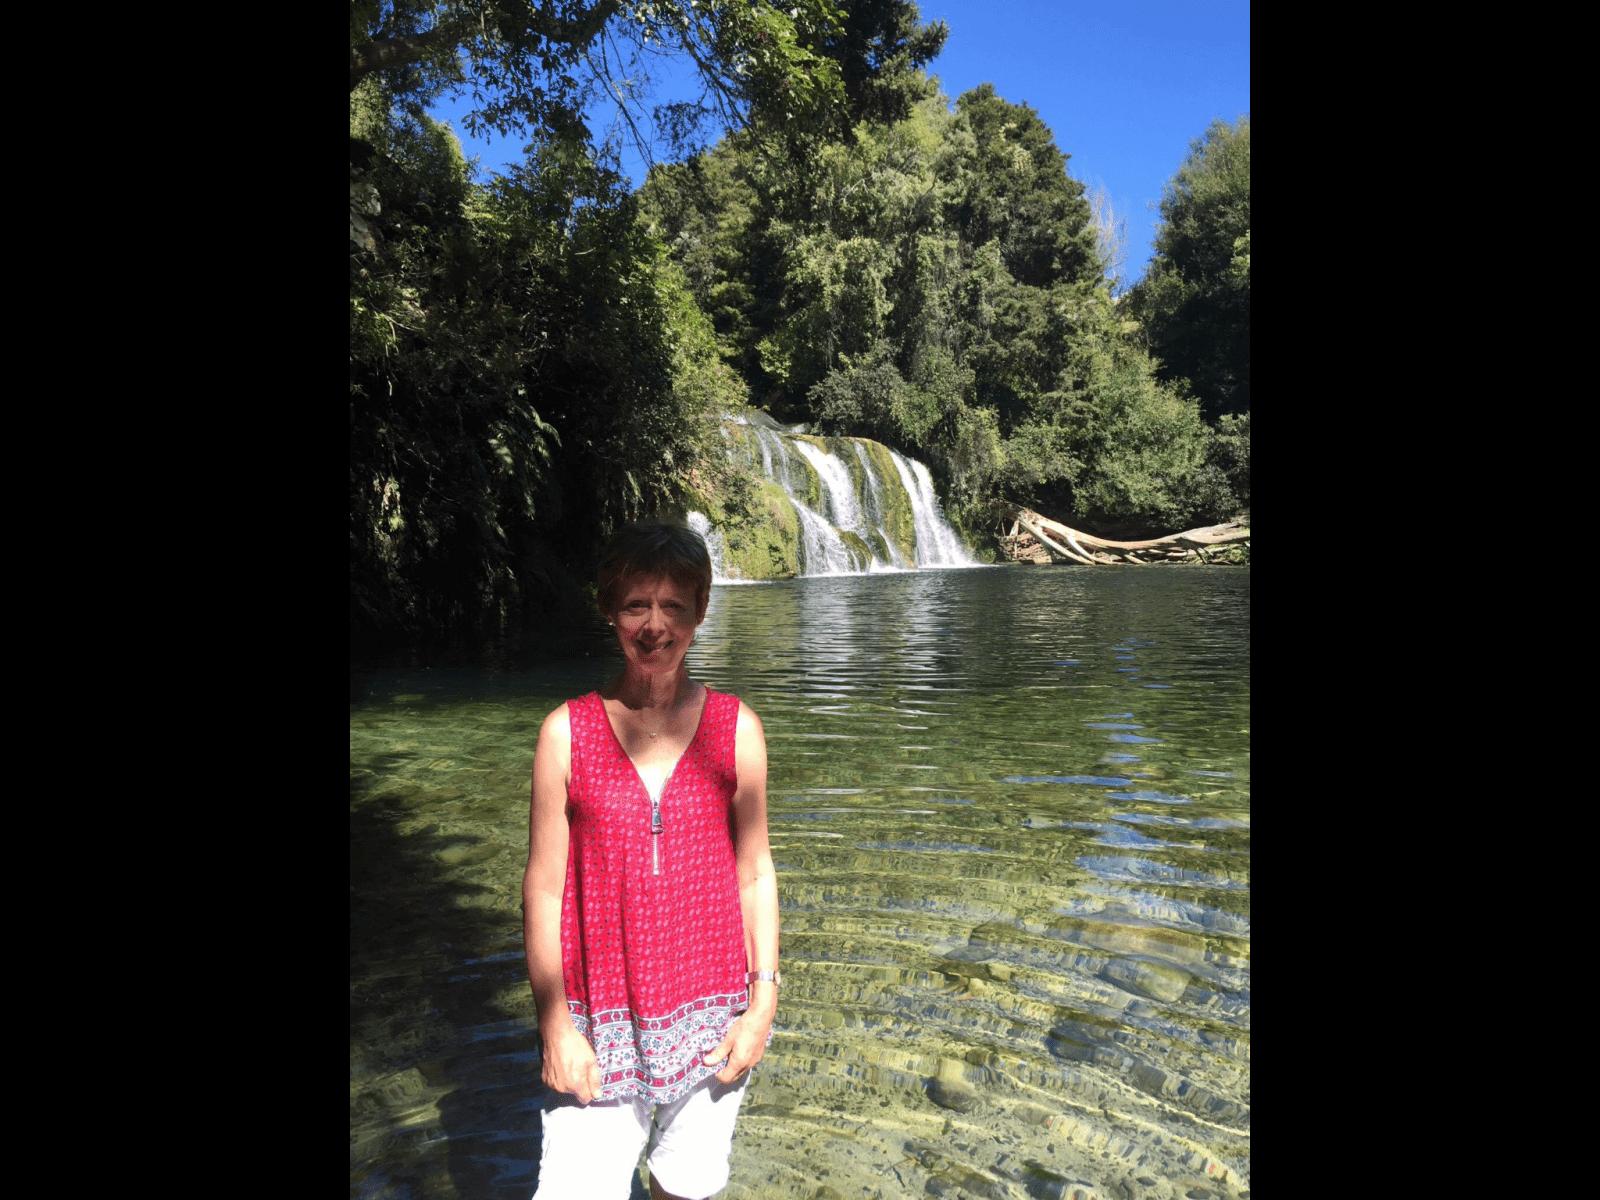 Angela from Gold Coast, Queensland, Australia